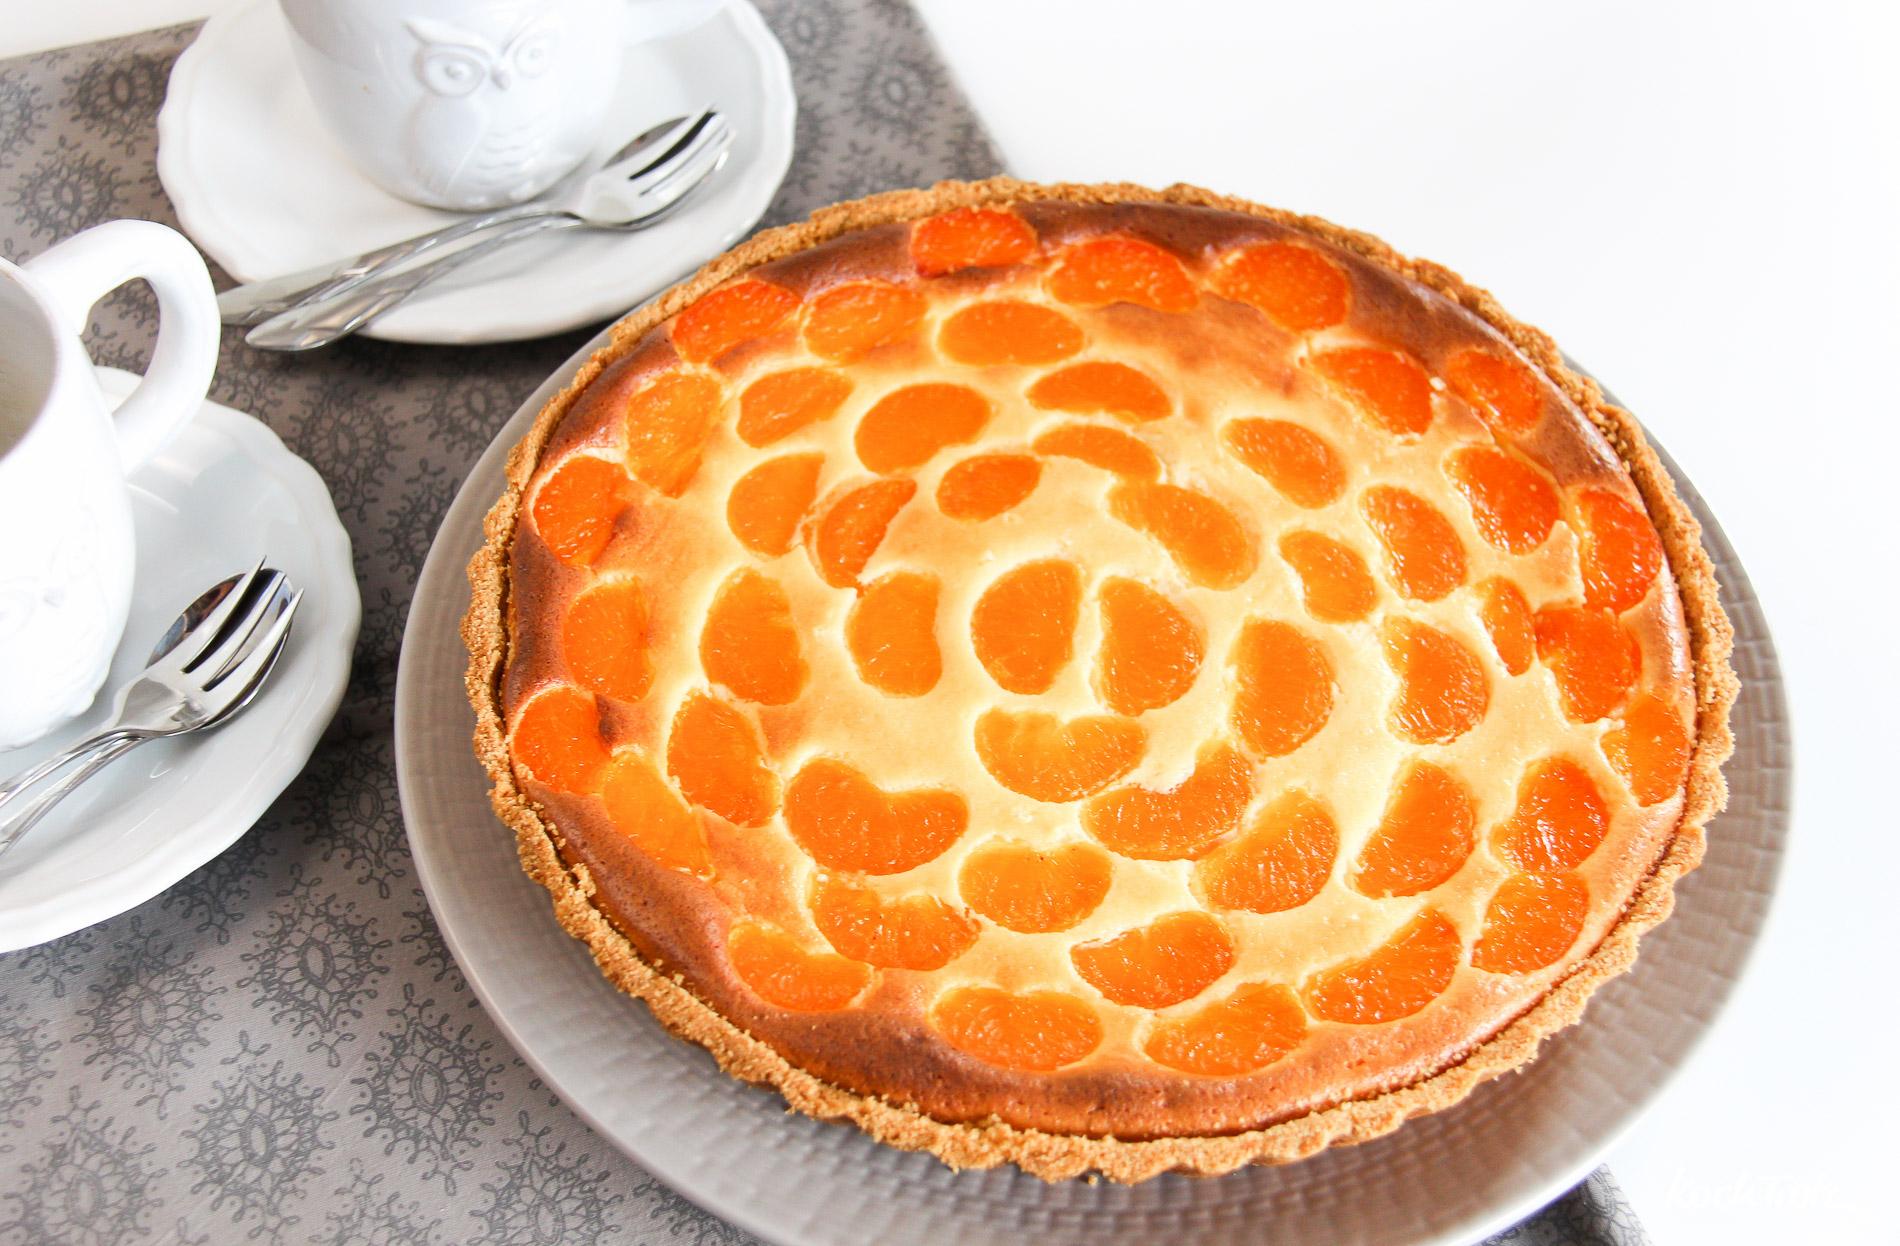 frischkaese-tarte-mit-fruechten-glutenfrei-laktosefrei-3Pauly-Osterspecial-4